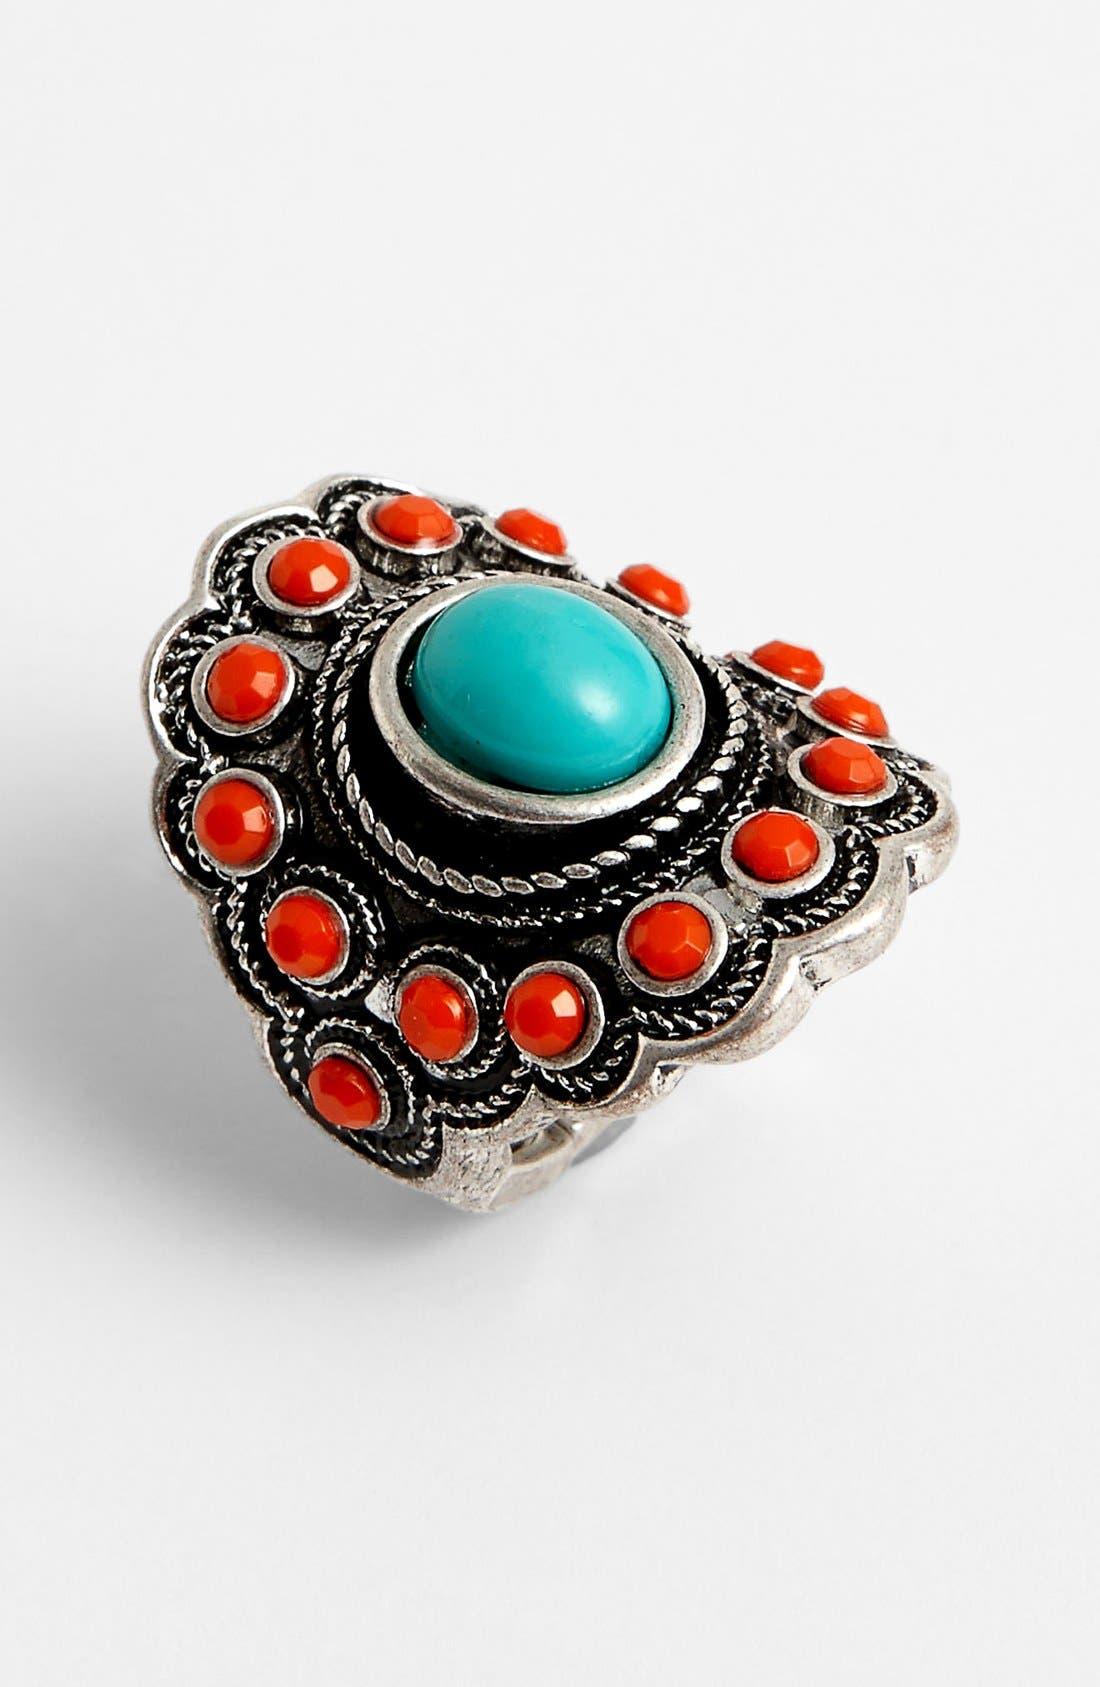 Main Image - BP. Turquoise & Coral Vintage Ring